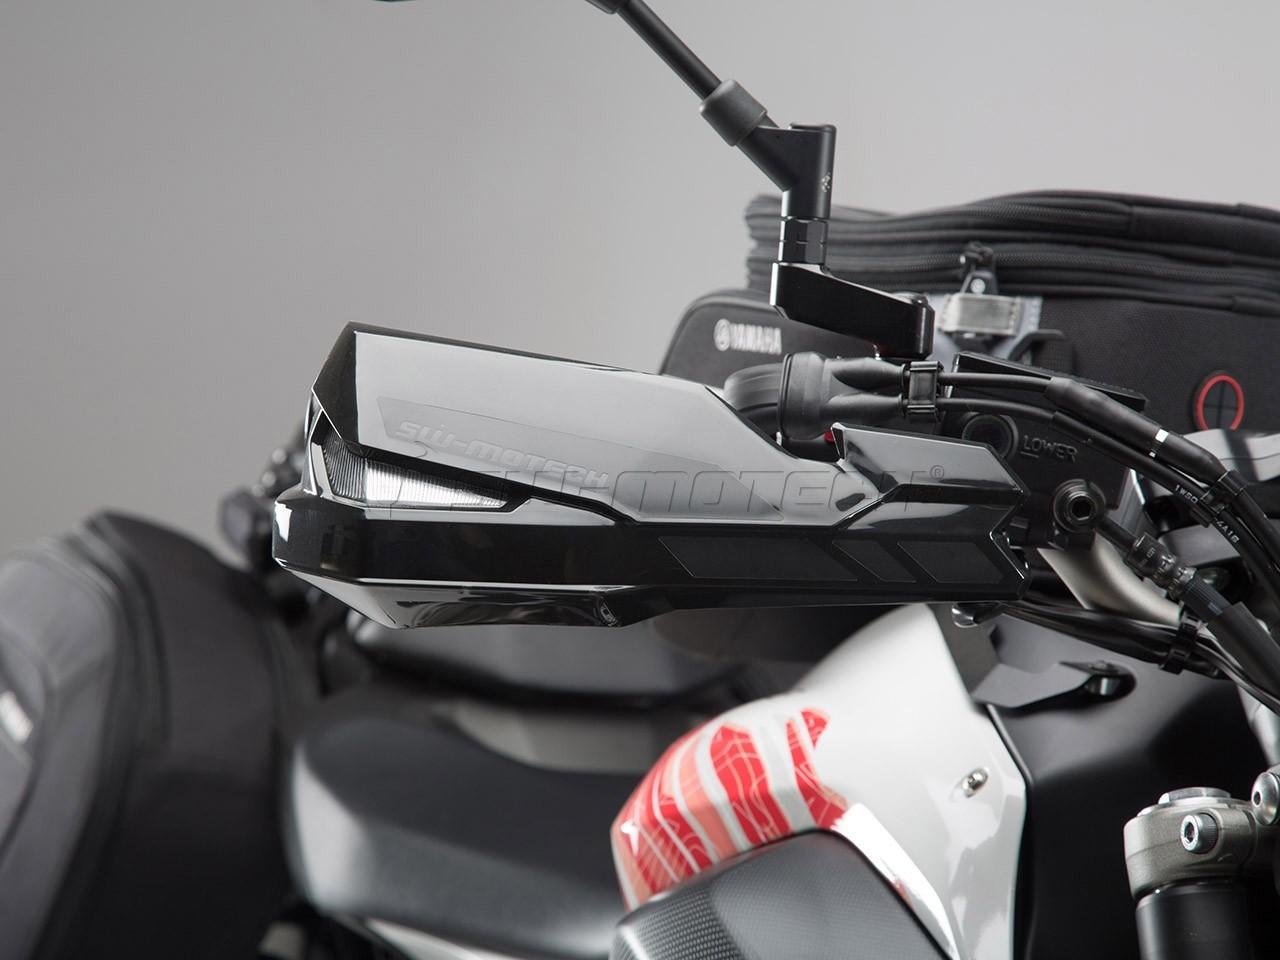 Yamaha XT 1200 Z Super Ténéré (14-) chrániče rukou KOBRA SW-Mote